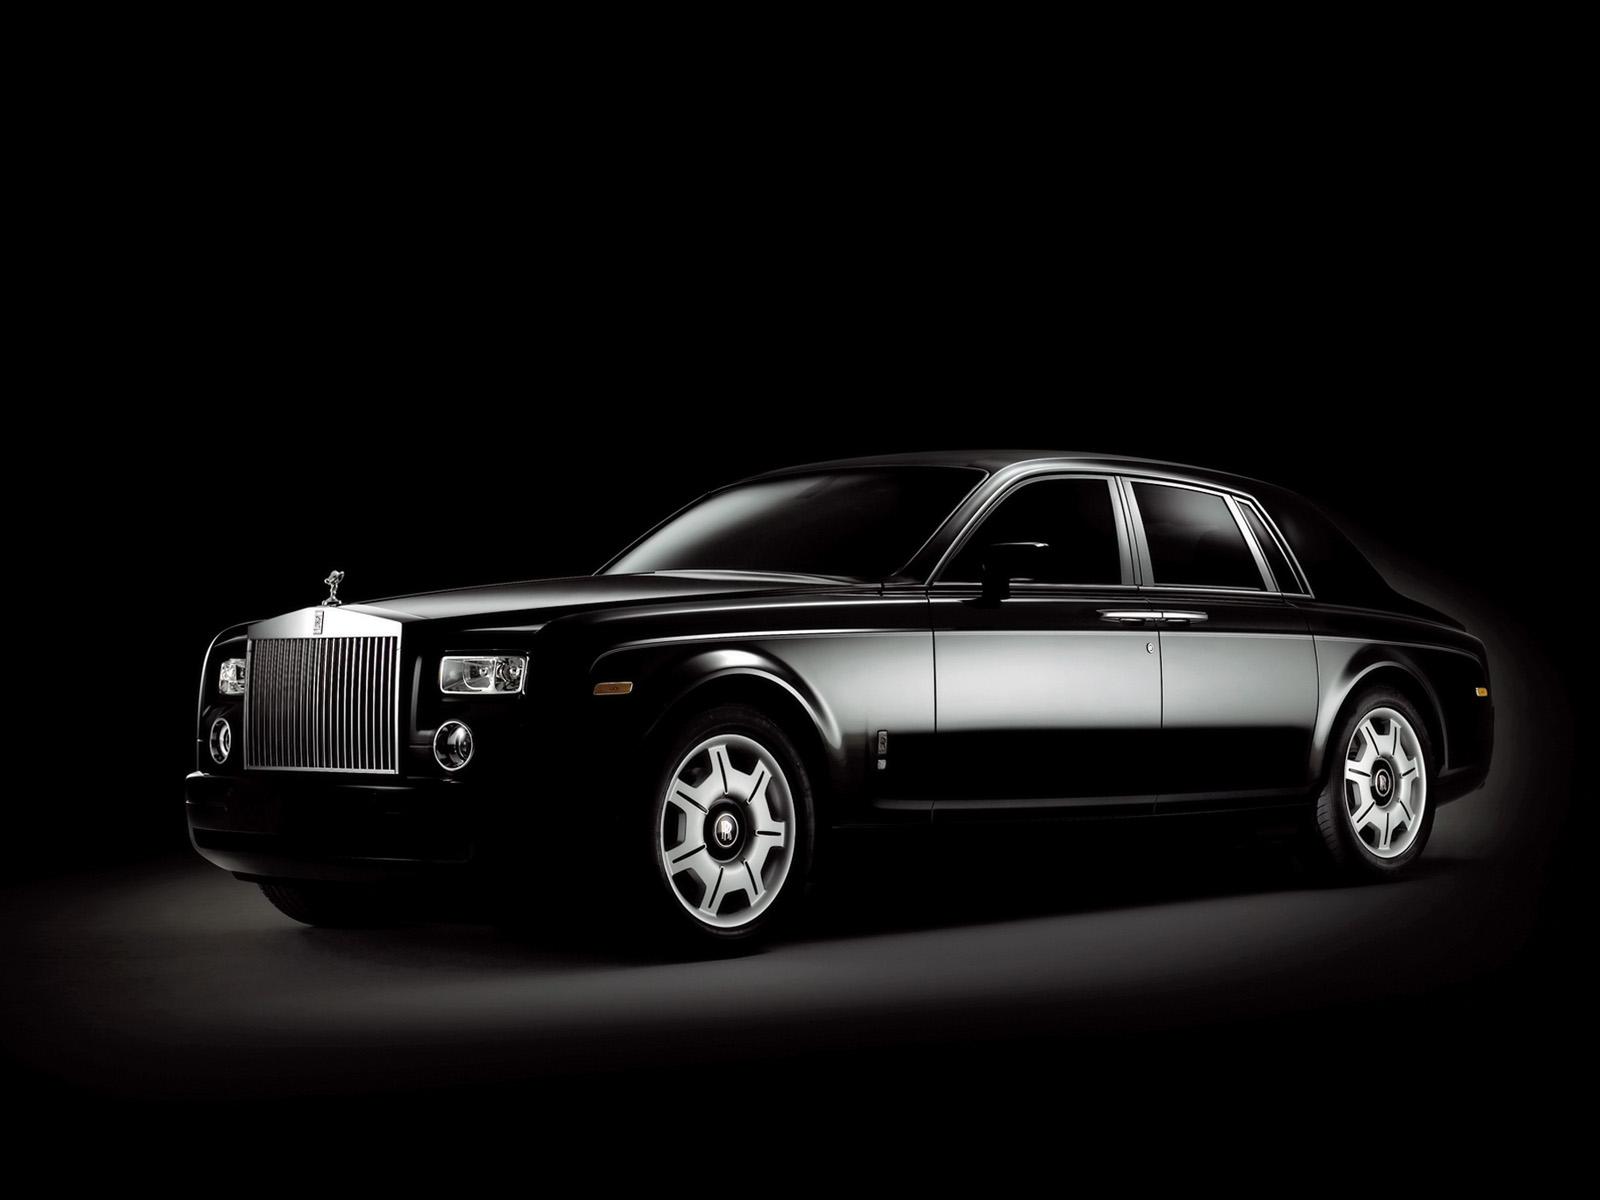 2006 Rolls-Royce Phantom Black